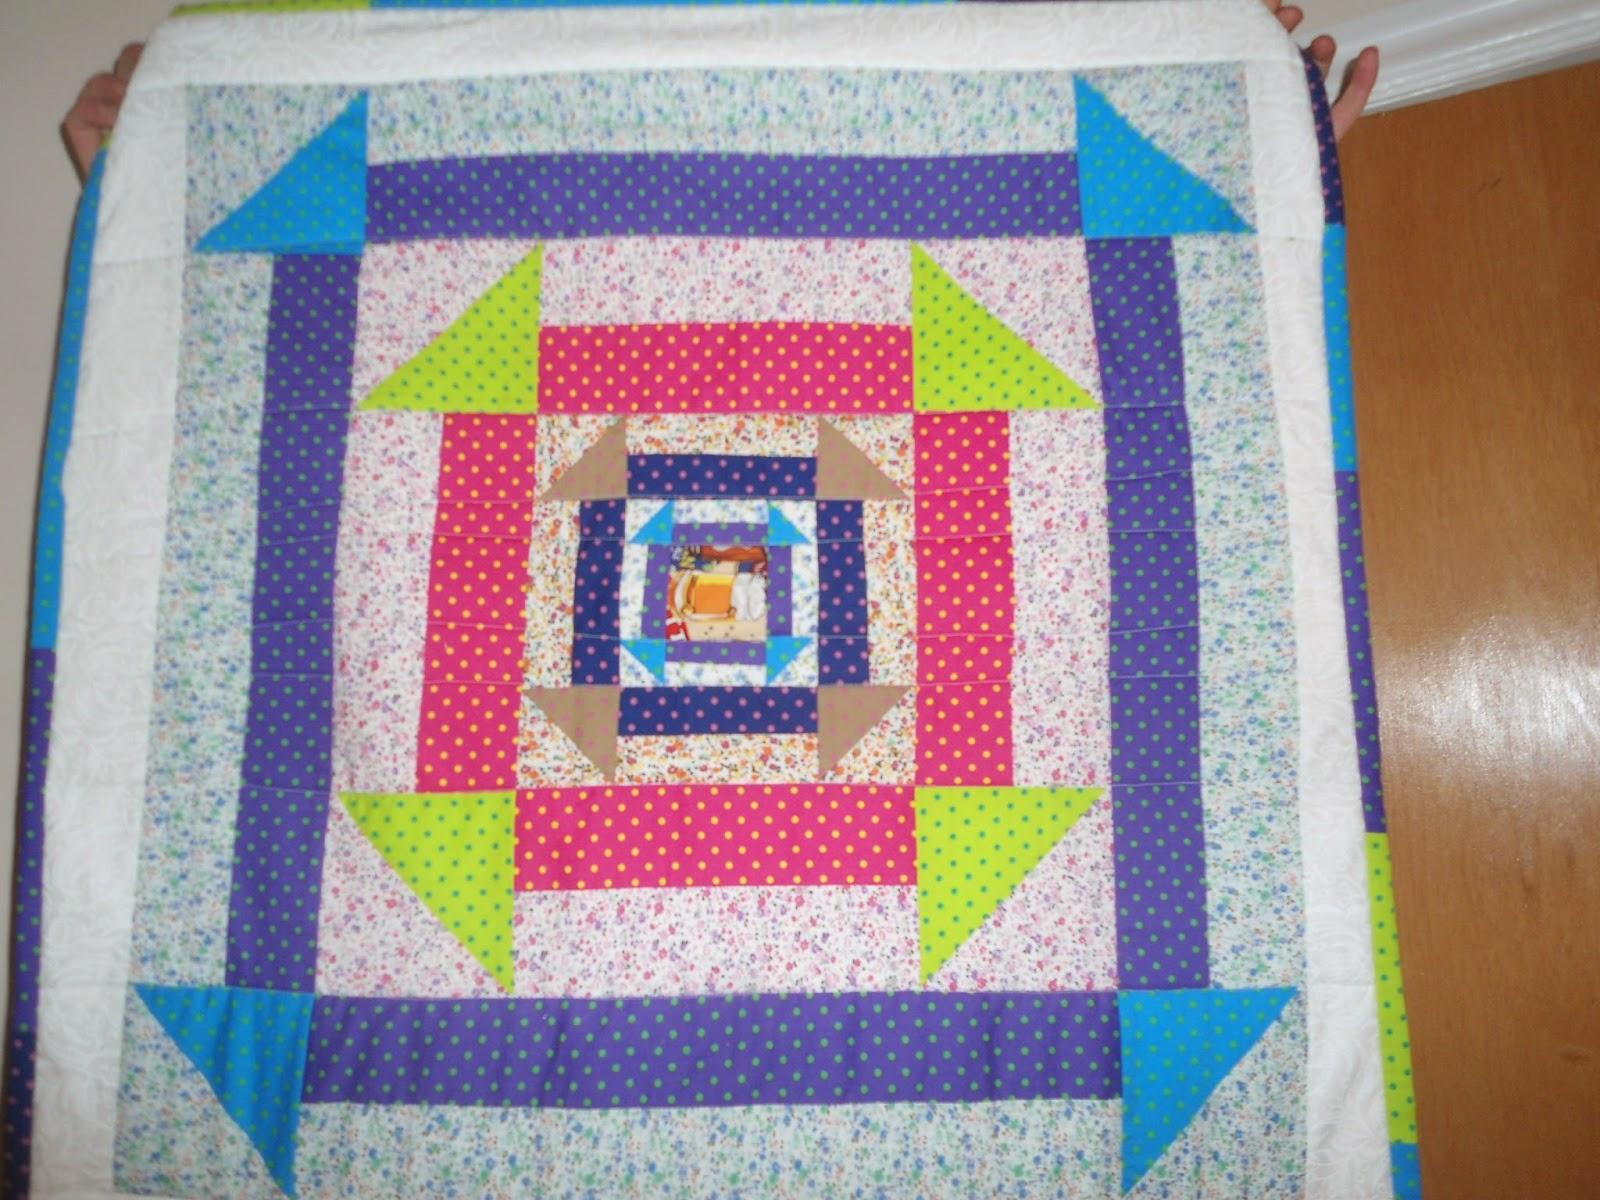 http://jennifercatherineshaw.blogspot.com/2015/02/completednested-churn-dash-quilt.html